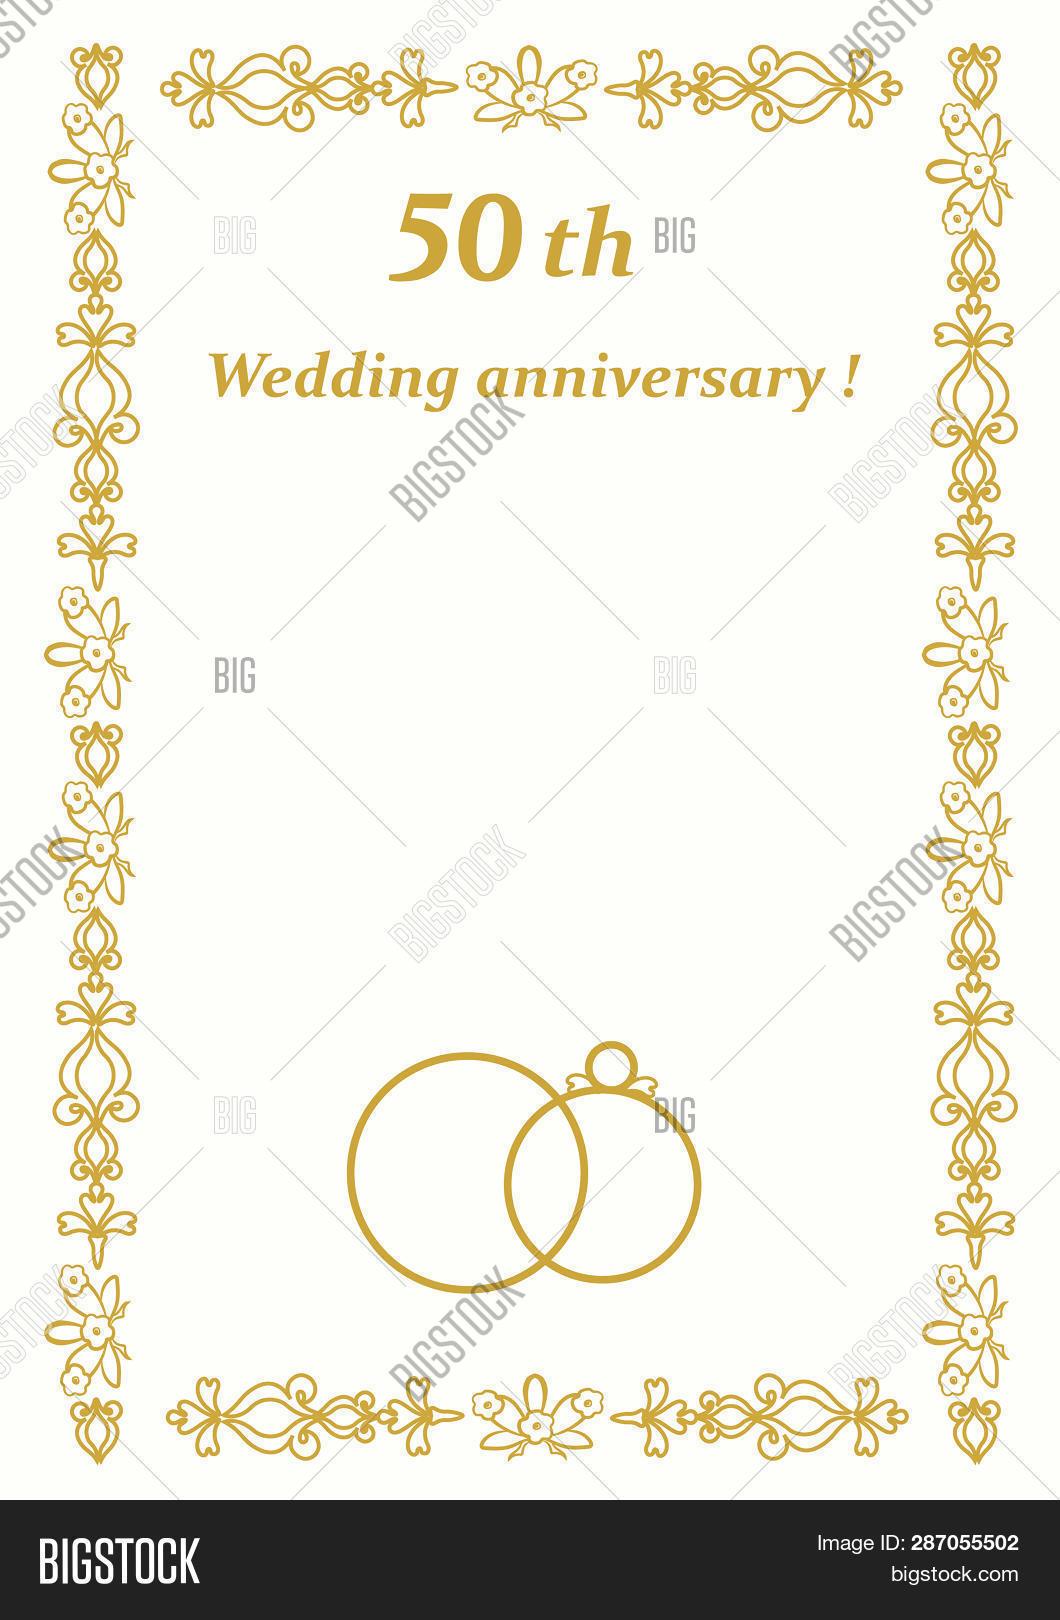 50th Wedding Image Photo Free Trial Bigstock